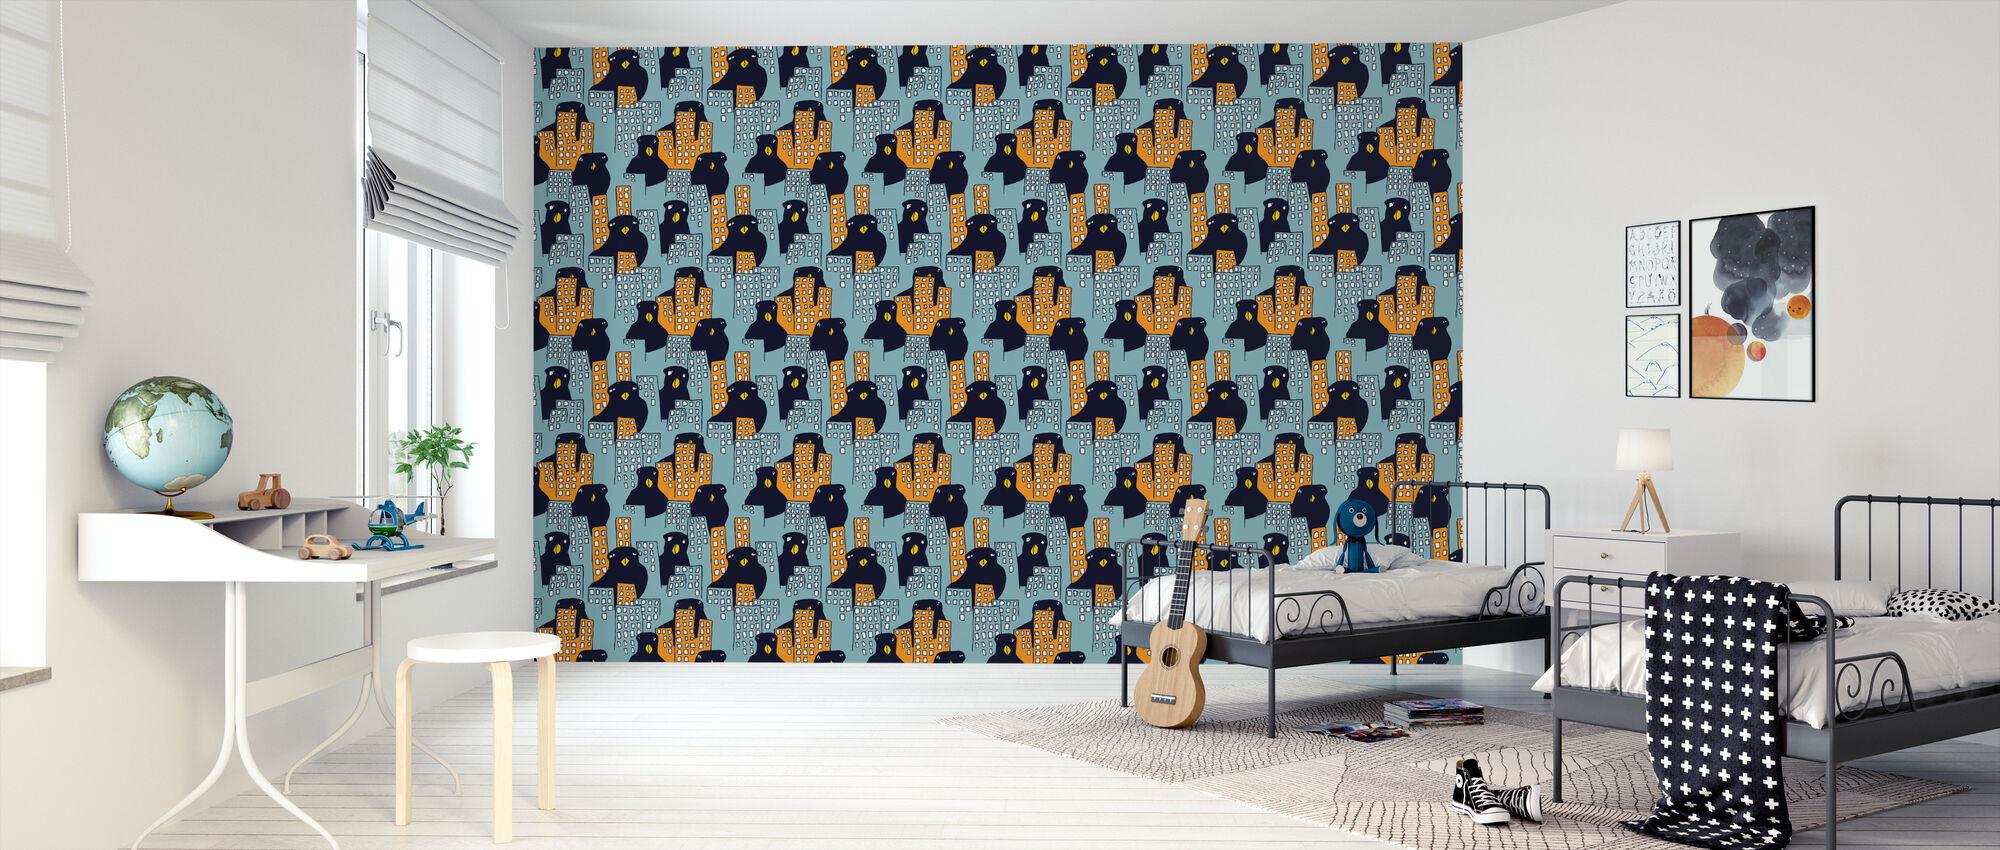 Åjabaduva Gröndal - Wallpaper - Kids Room